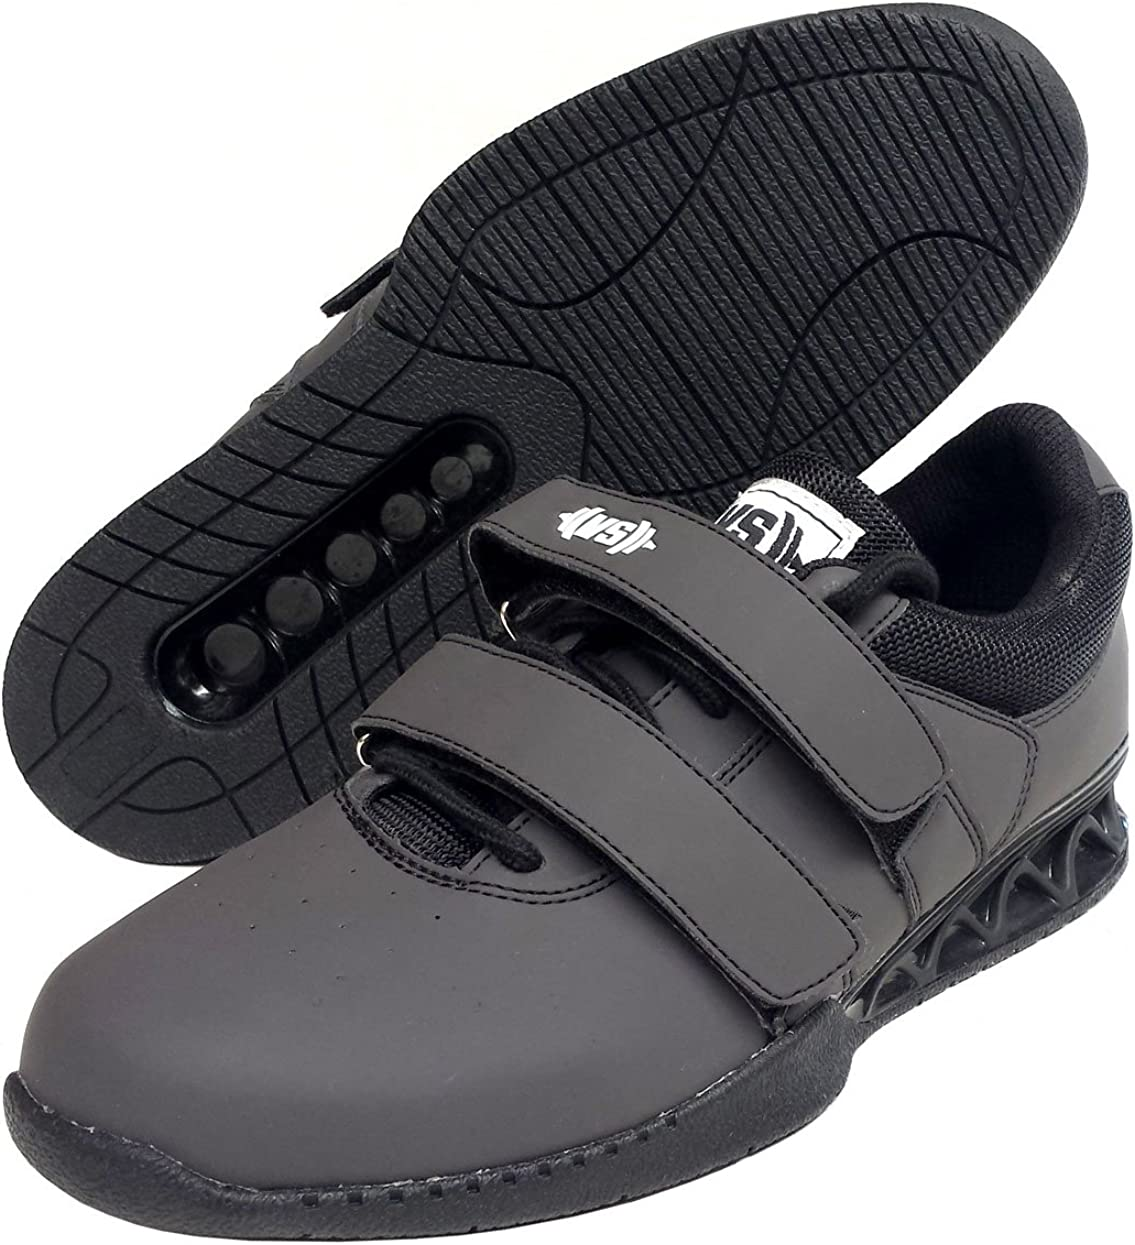 VS ATHLETICS Weightlifting Shoe II